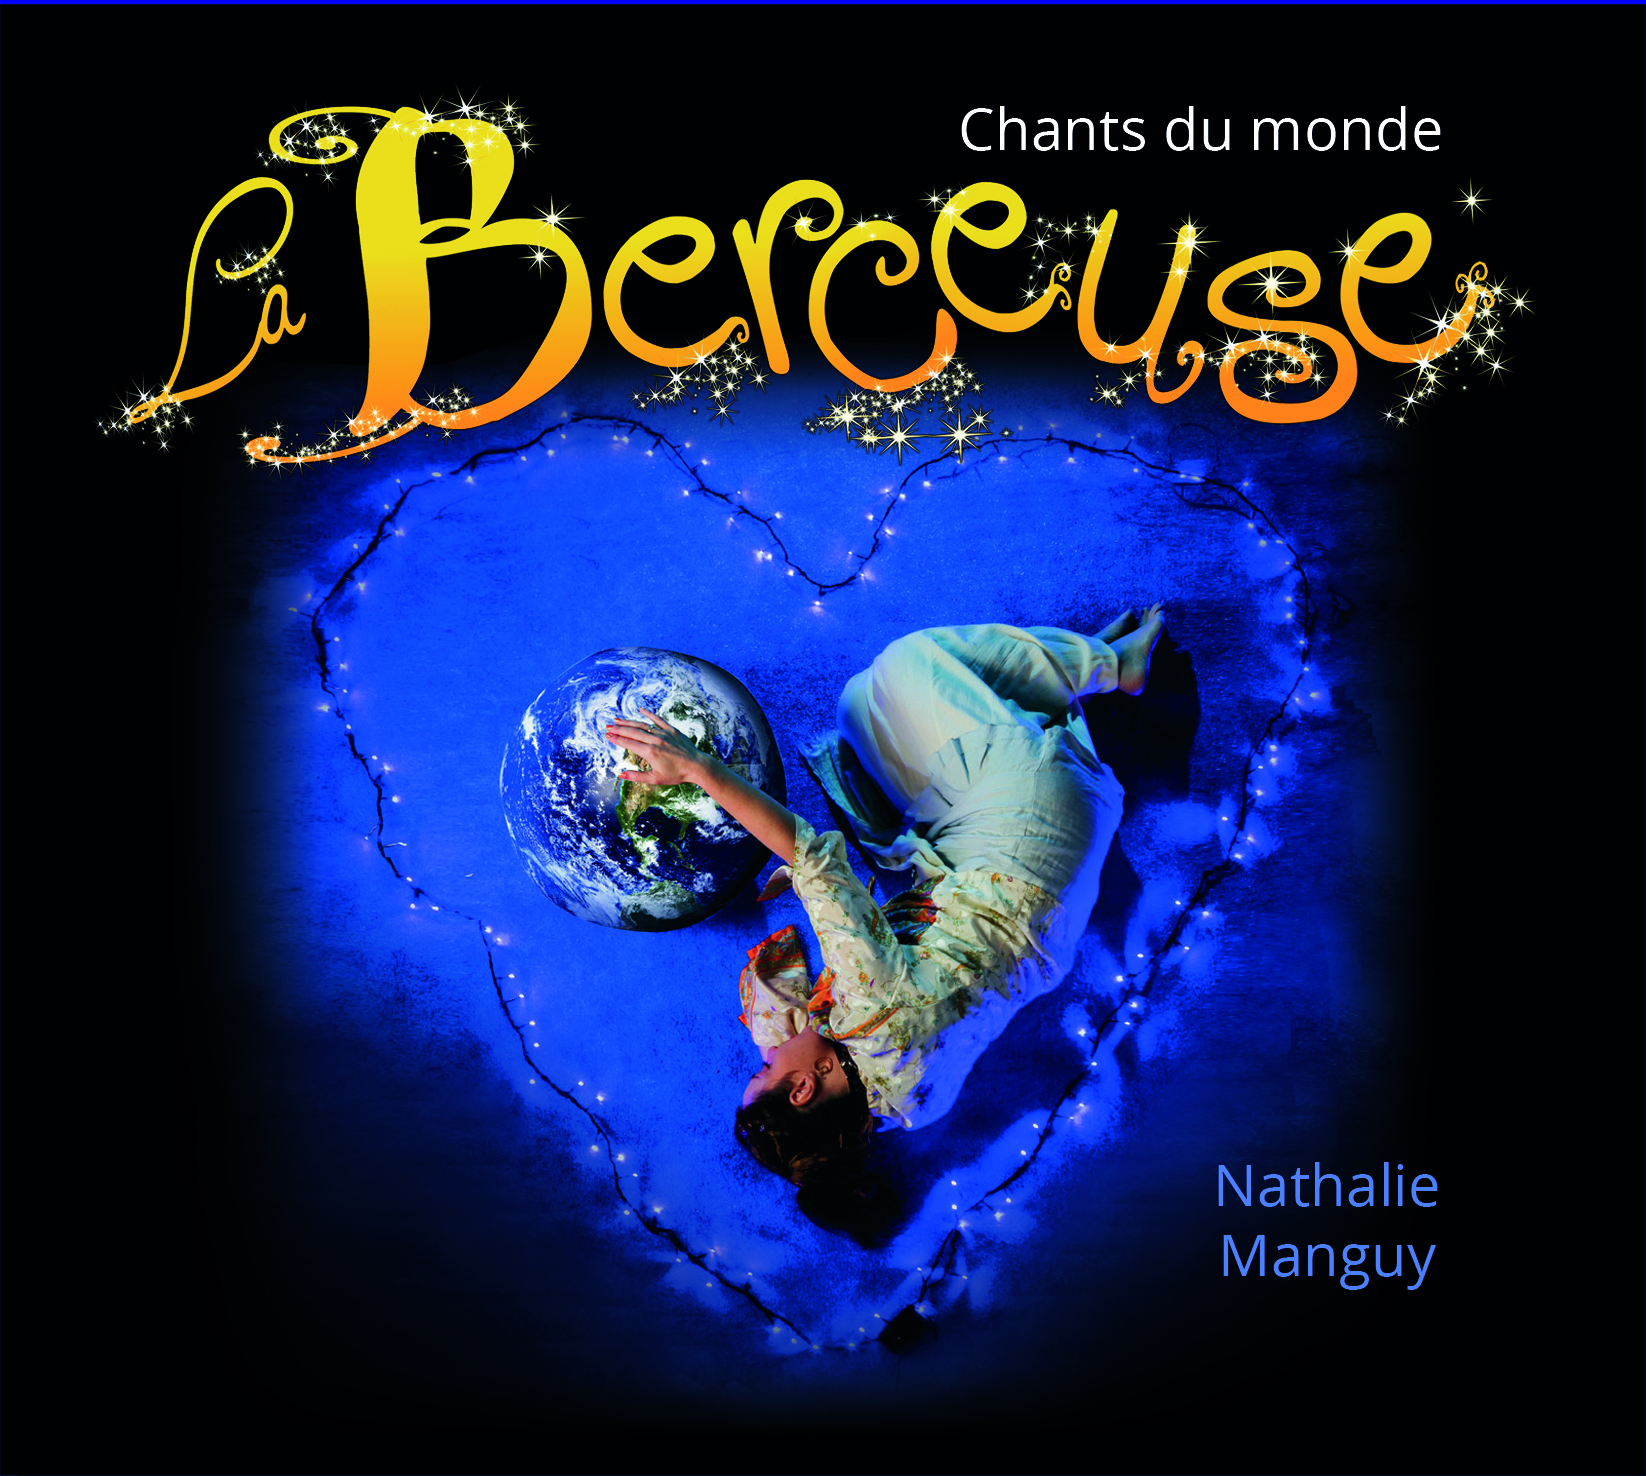 La Berceuse : Chants du monde / Nathalie Manguy |